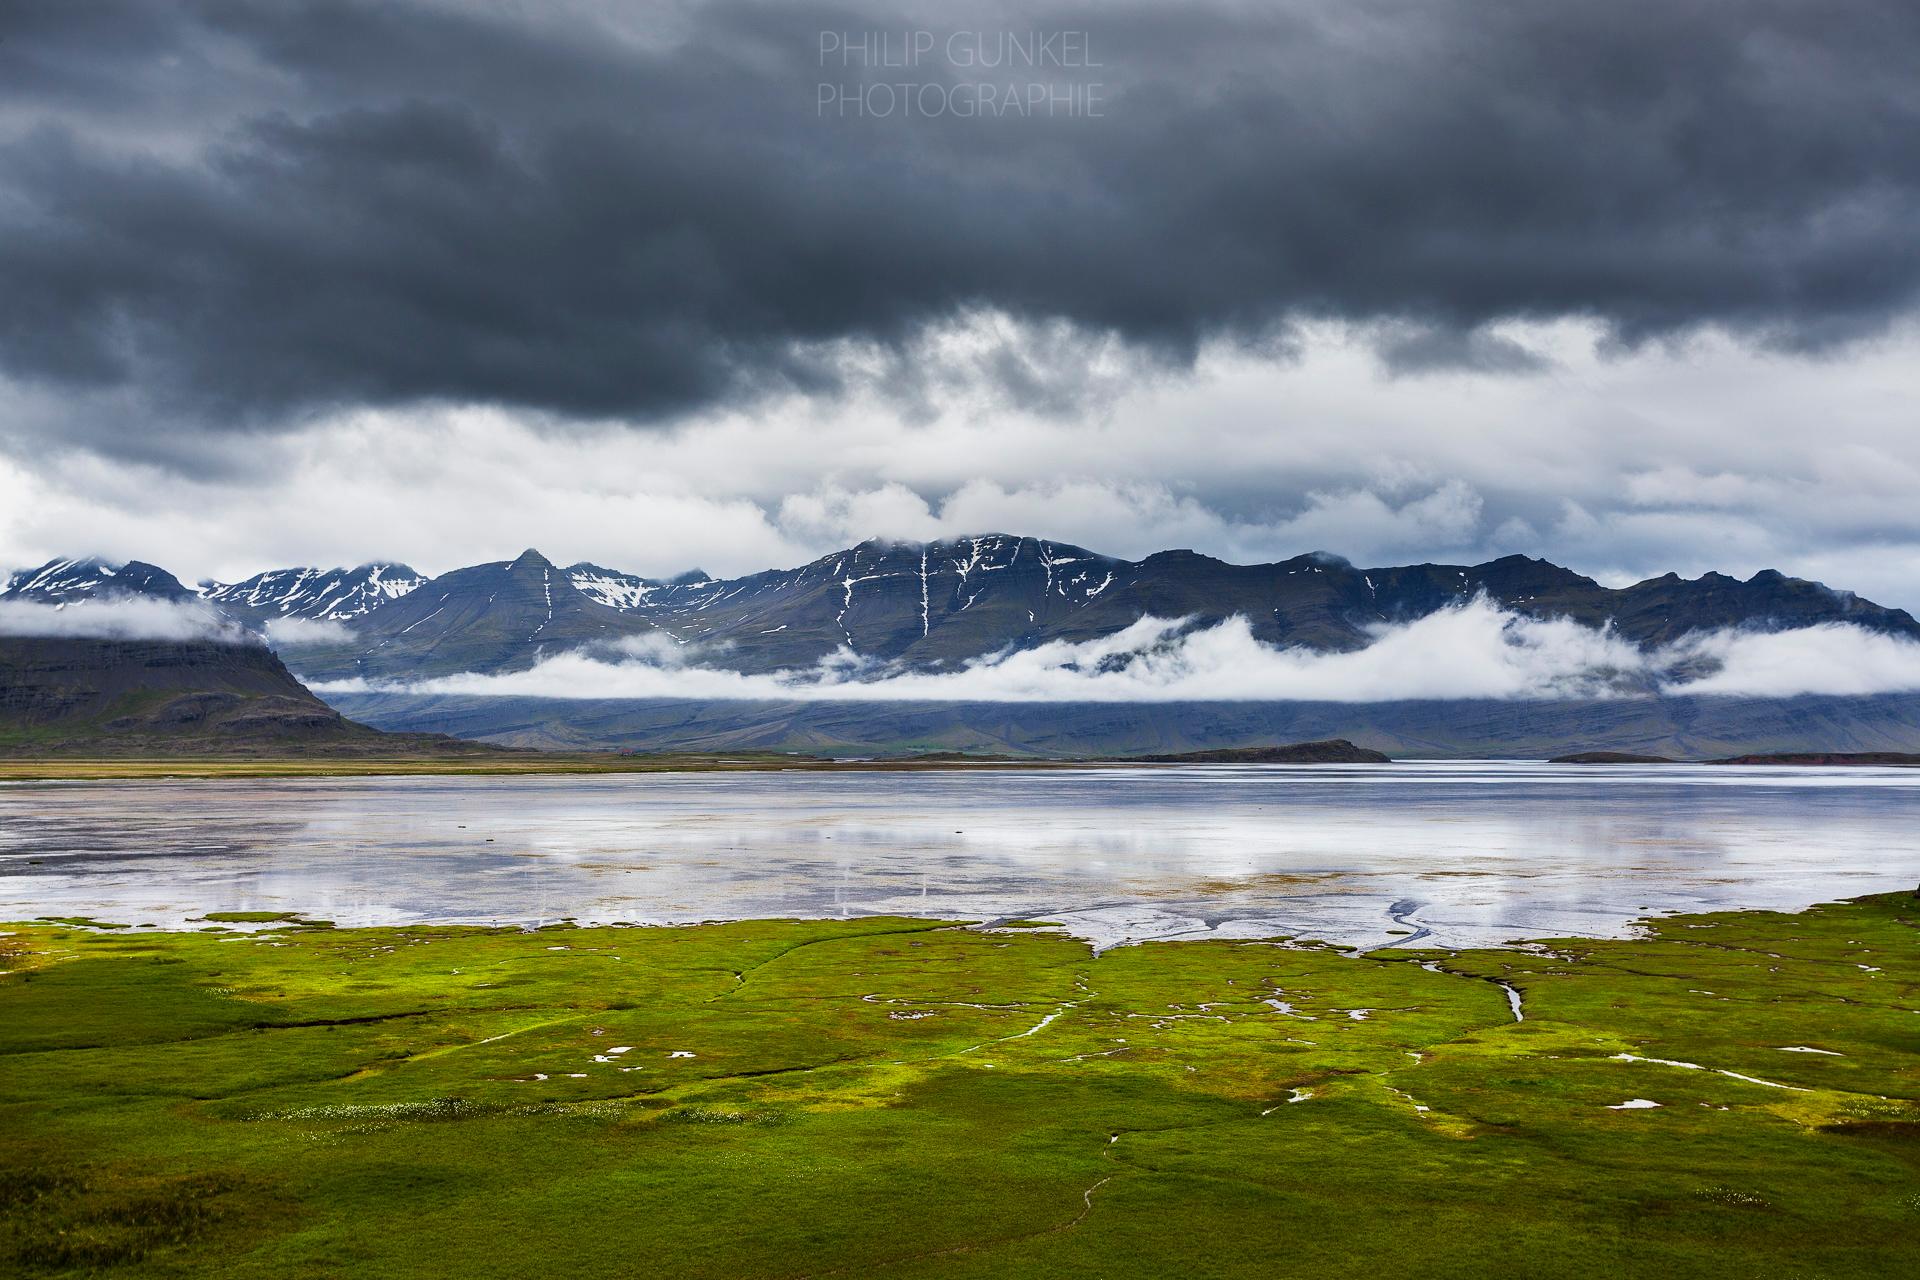 ISLAND-SAGA_Philip_Gunkel-89srgb